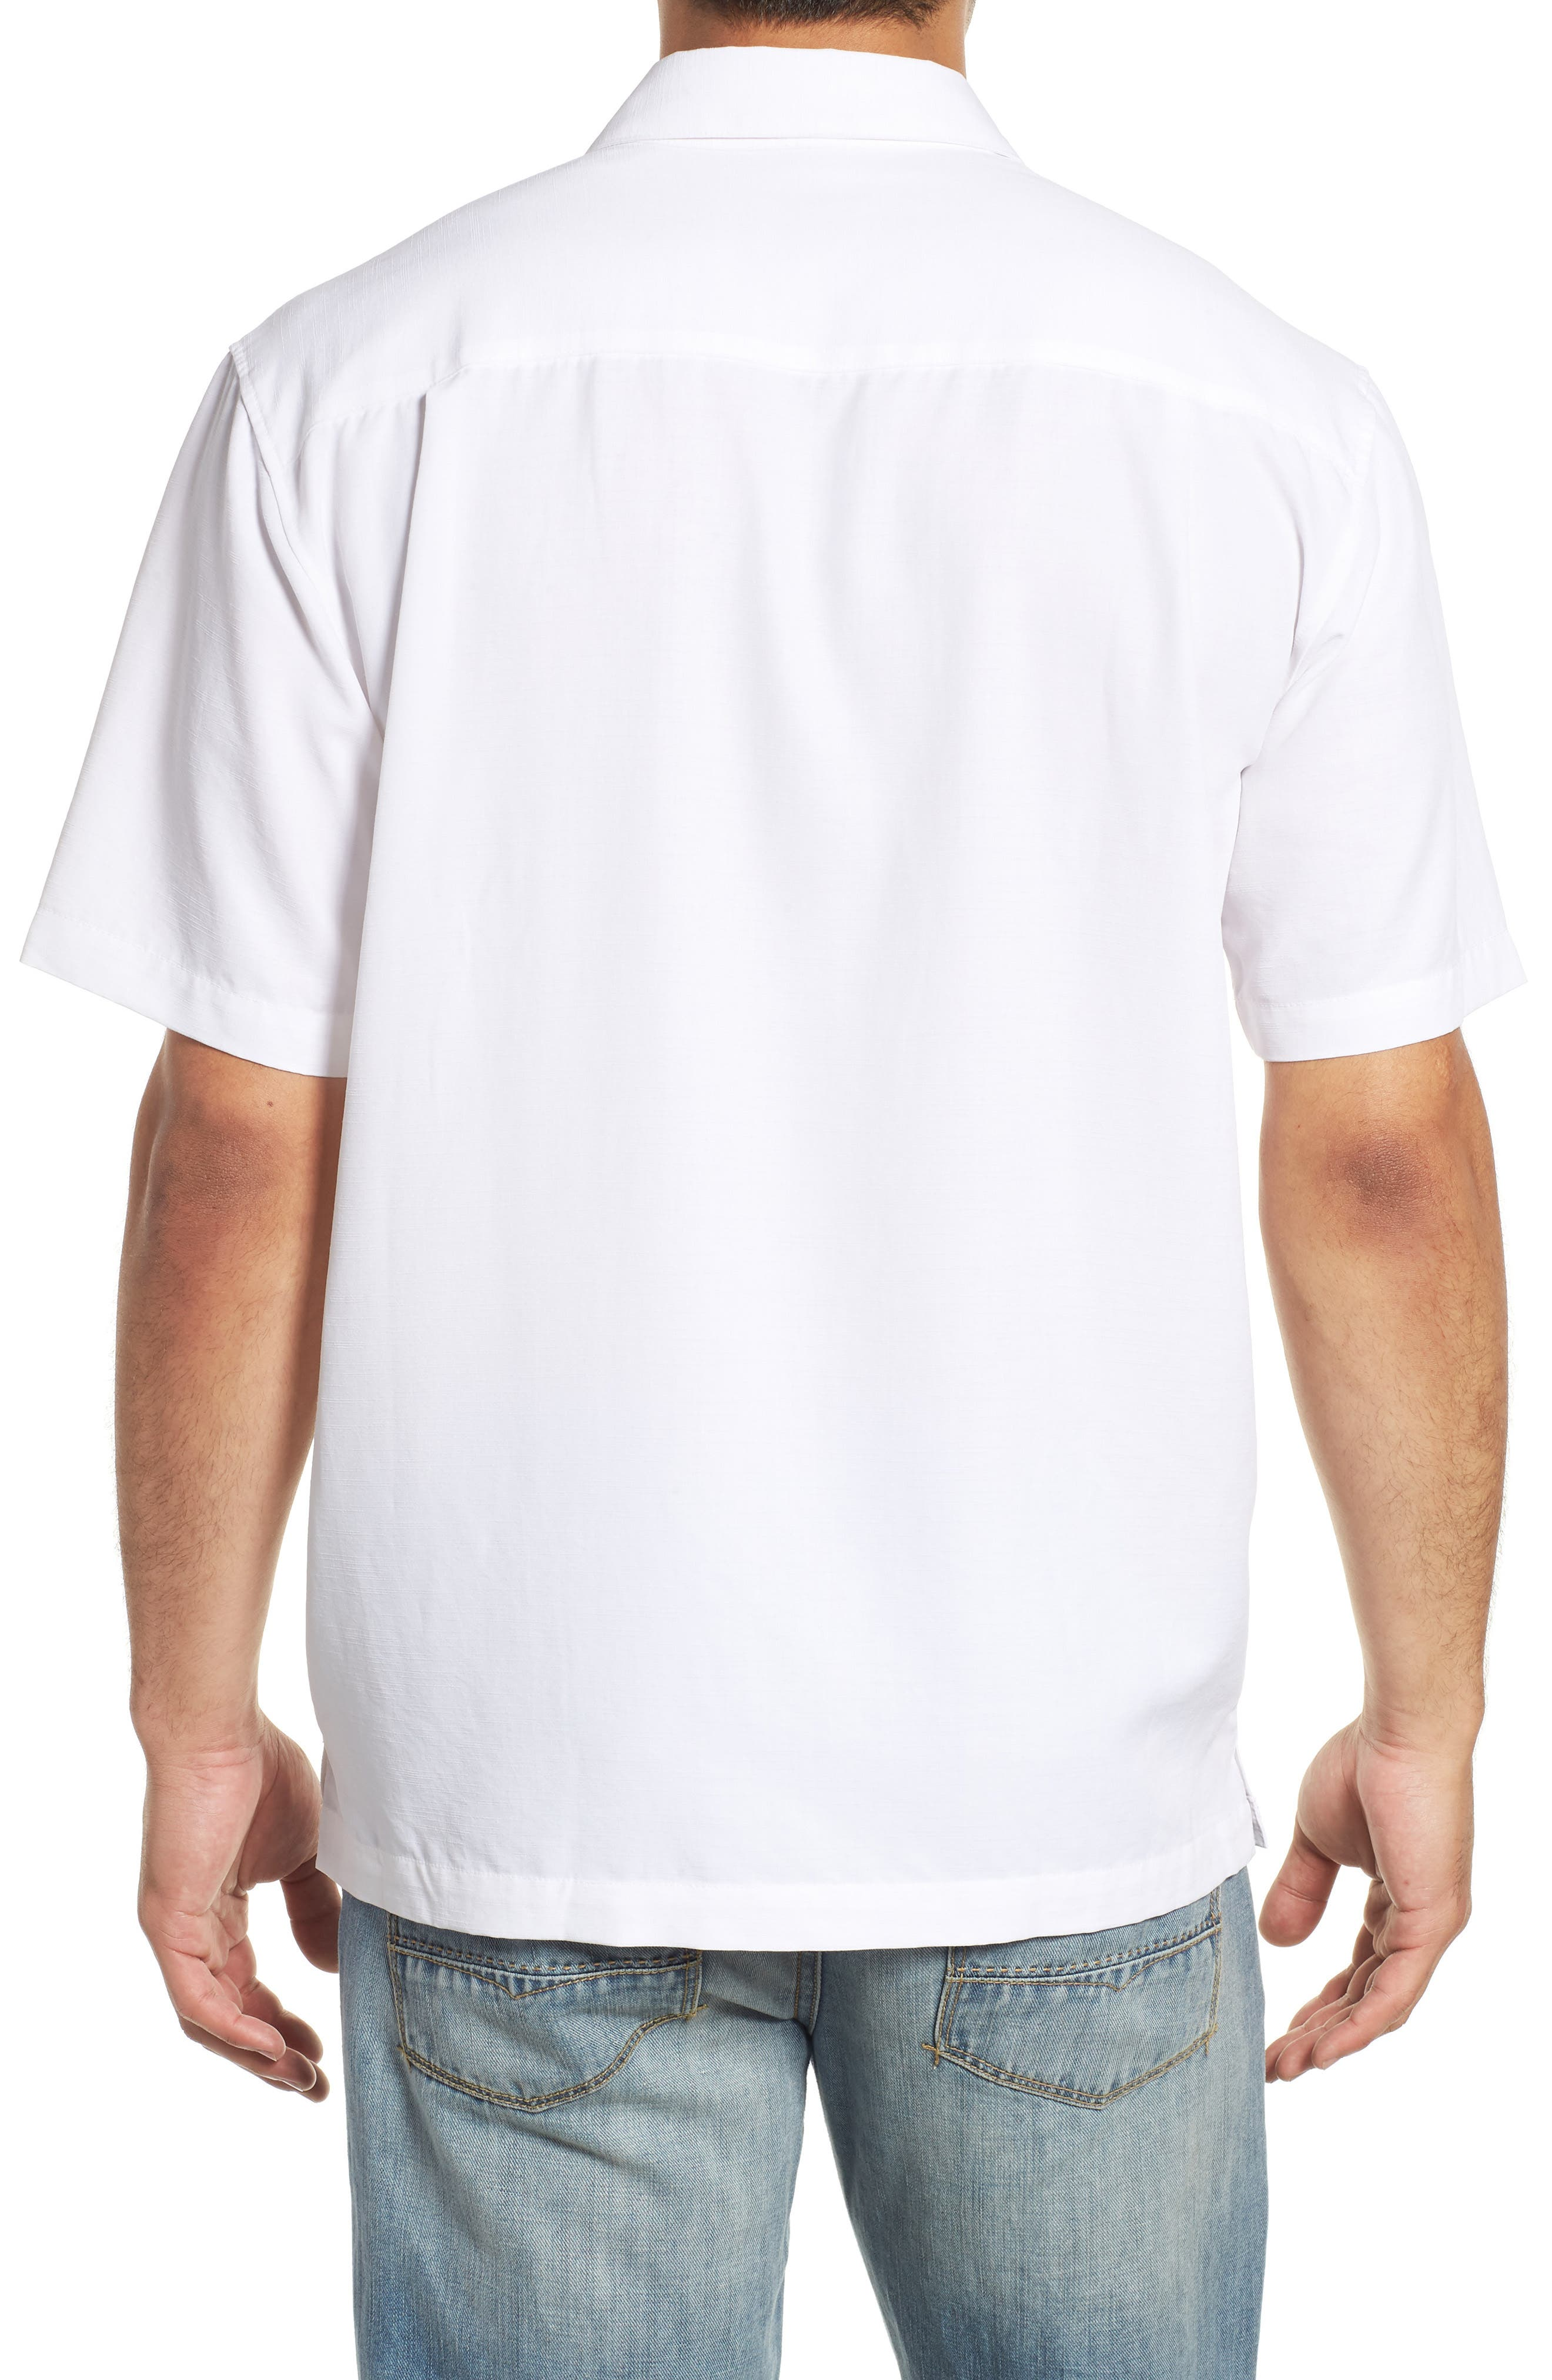 QUIKSILVER WATERMAN COLLECTION,                             Tahiti Palms Regular Fit Sport Shirt,                             Alternate thumbnail 3, color,                             WHITE